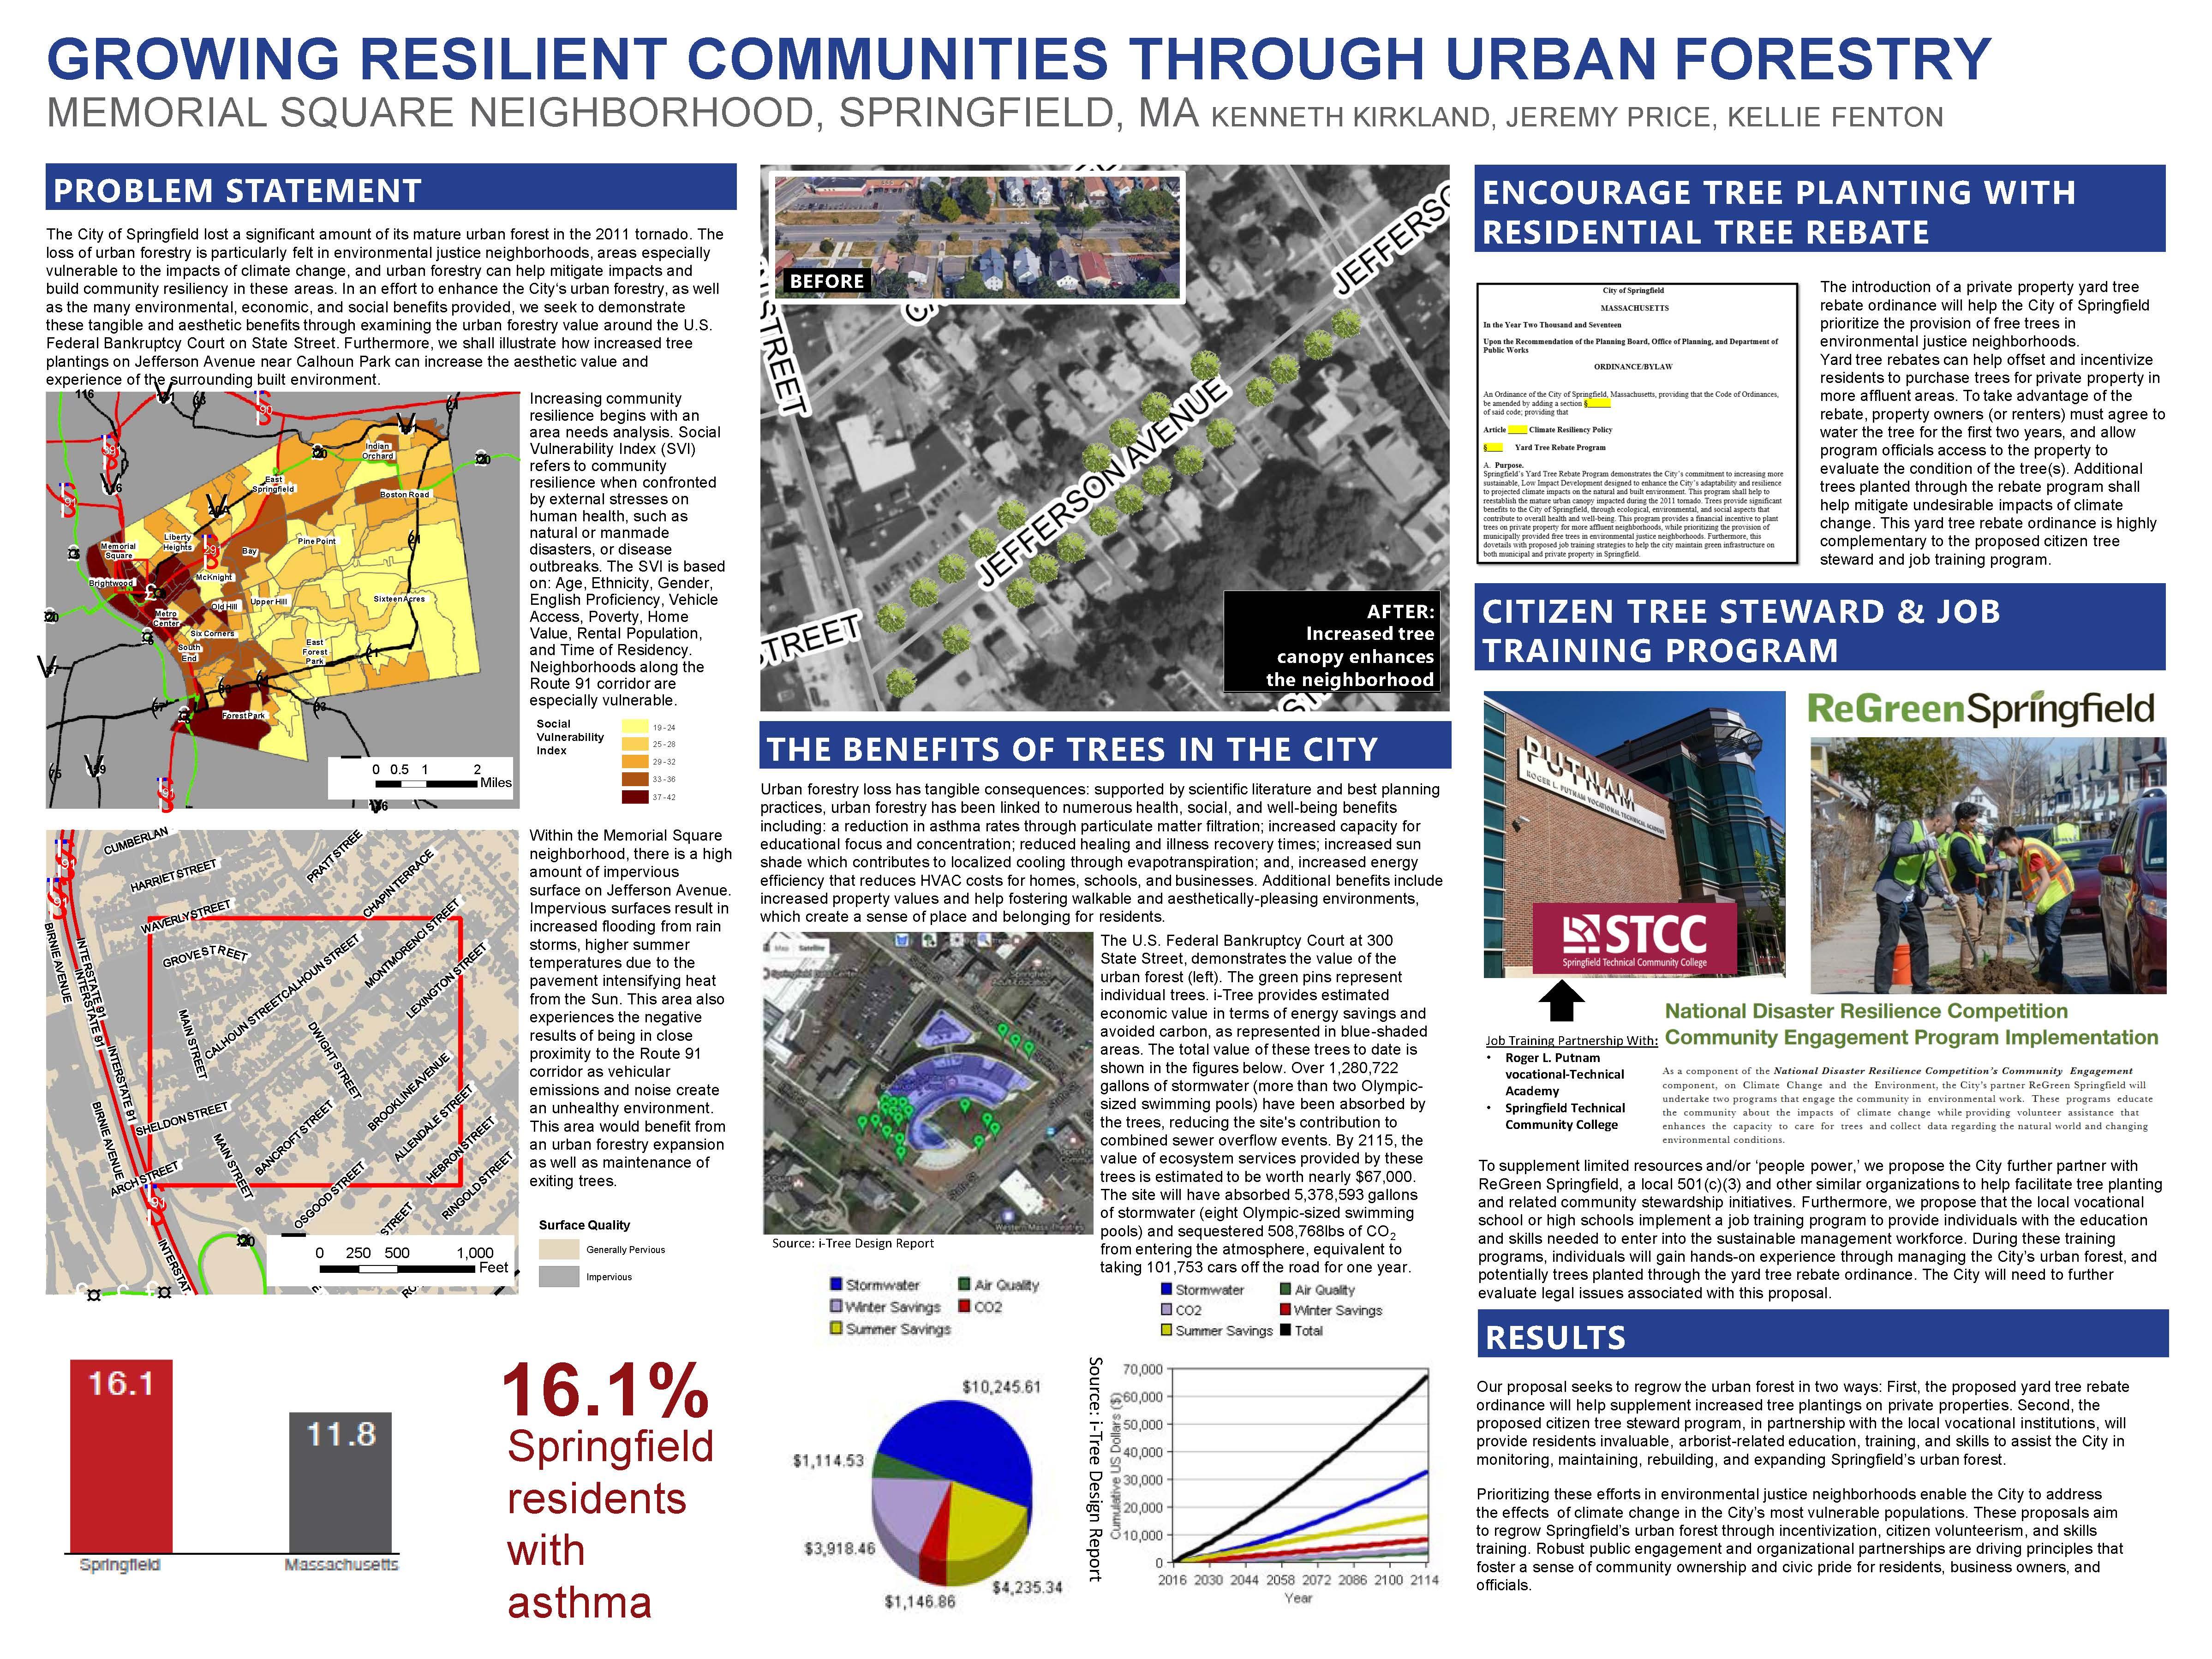 GROWING RESILIENT COMMUNITIES THROUGH URBAN FORESTRY MEMORIAL SQUARE NEIGHBORHOOD, SPRINGFIELD, MA - KENNETH KIRKLAND, JEREMY PRICE, KELLIE FENTON